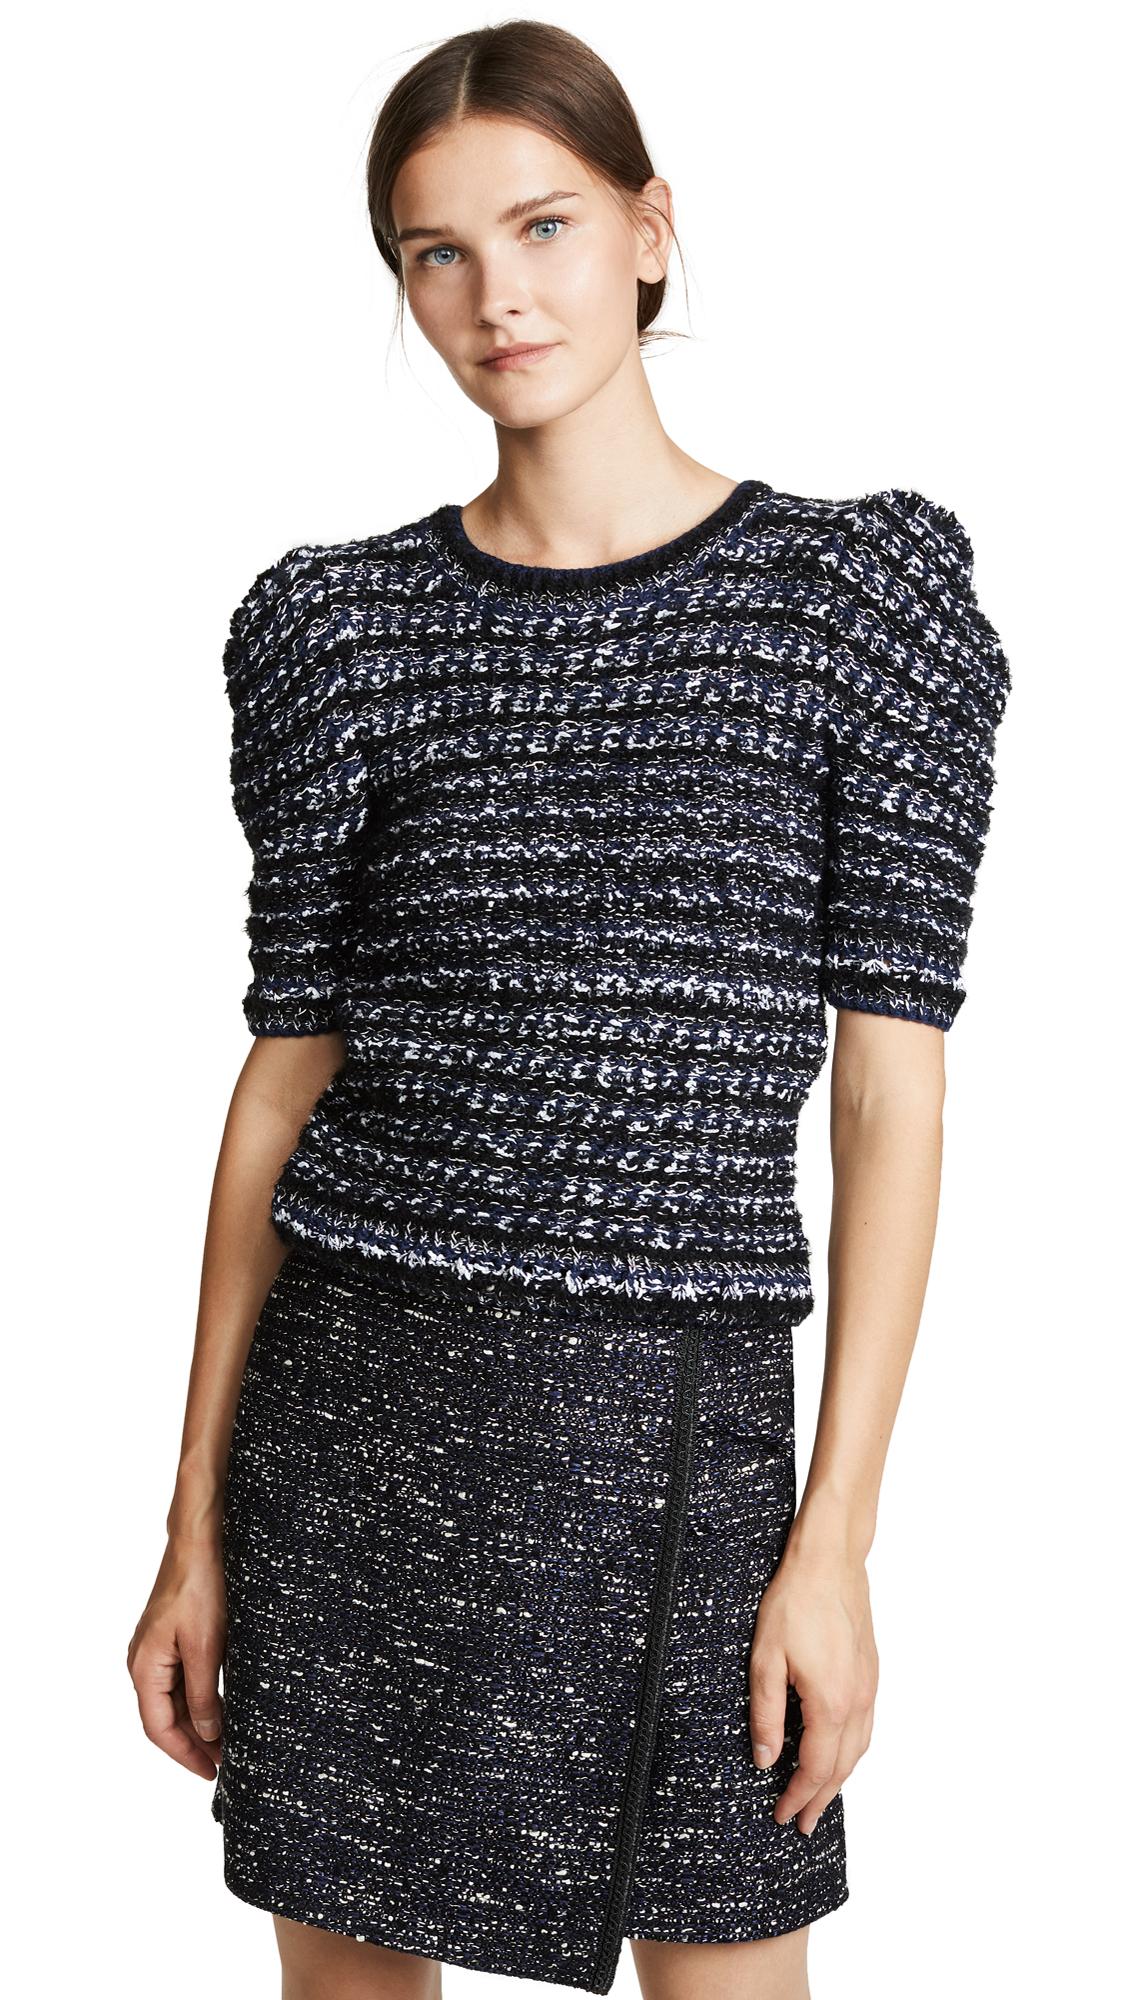 Adam Lippes Tweed Puff Sleeve Sweater - Navy Multi